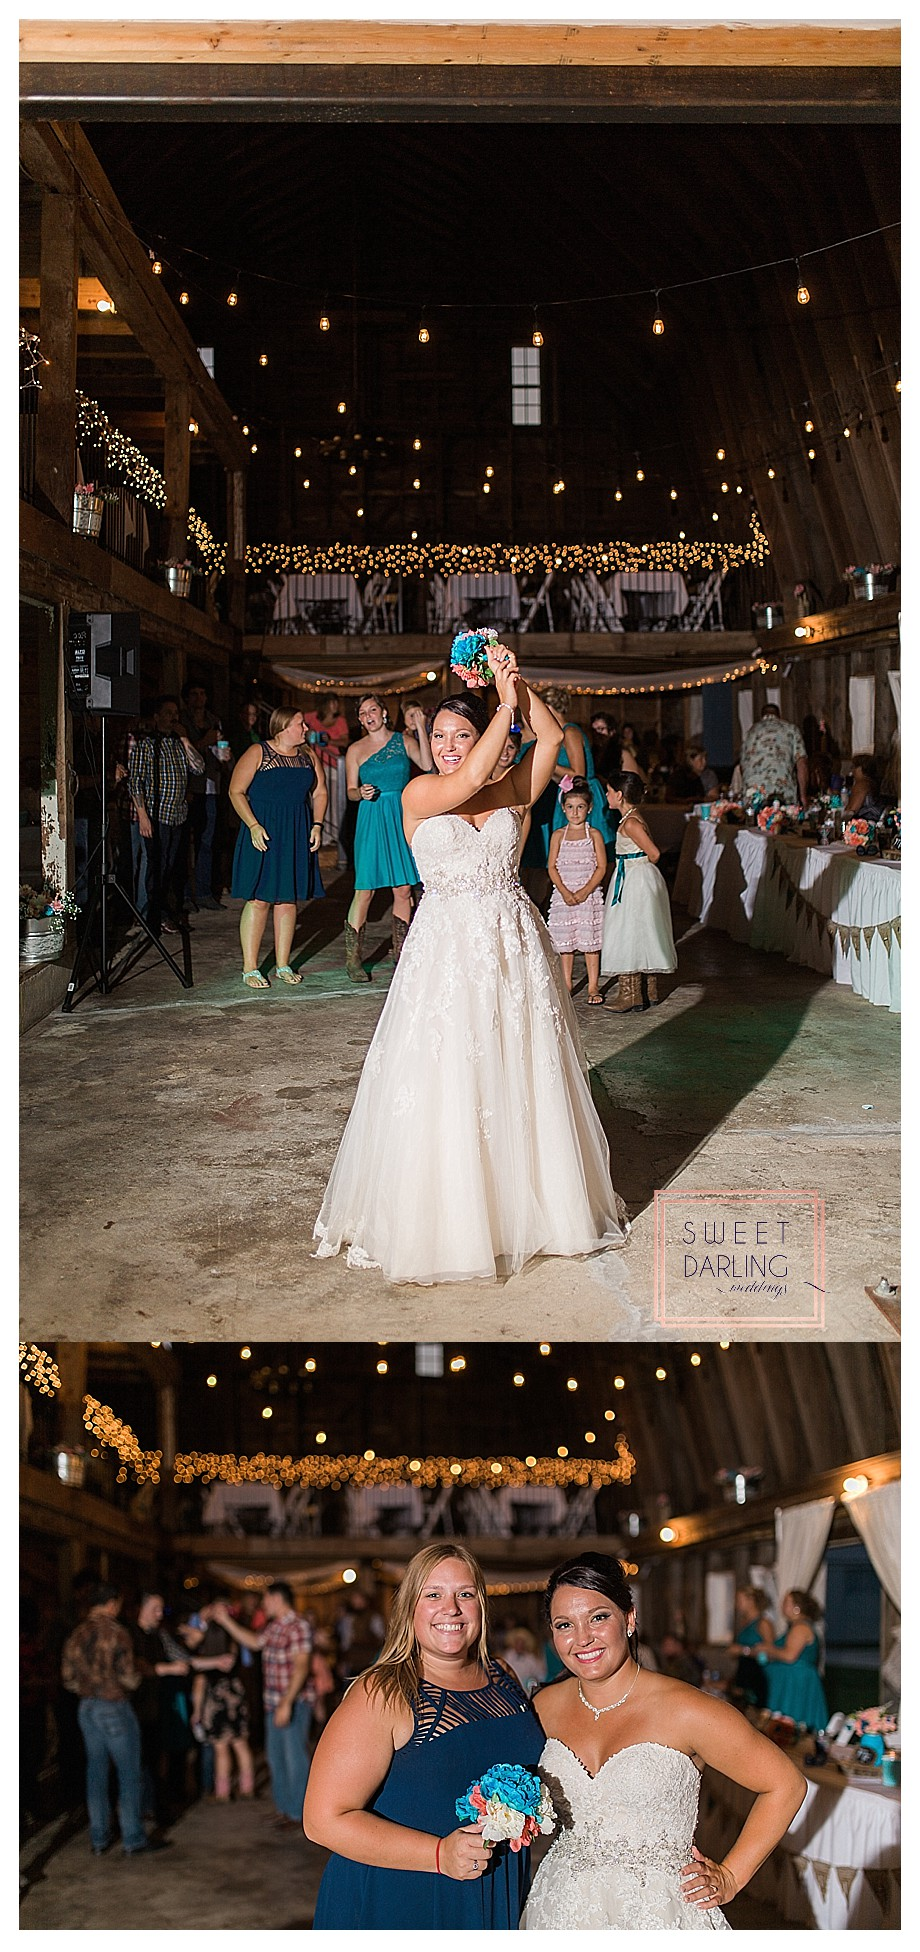 wedding-barn-farm-horses-sparkler-exit-Engelbrecht-Farm-Paxton-Illinois-Sweet-Darling-Weddings-Photographer_0491